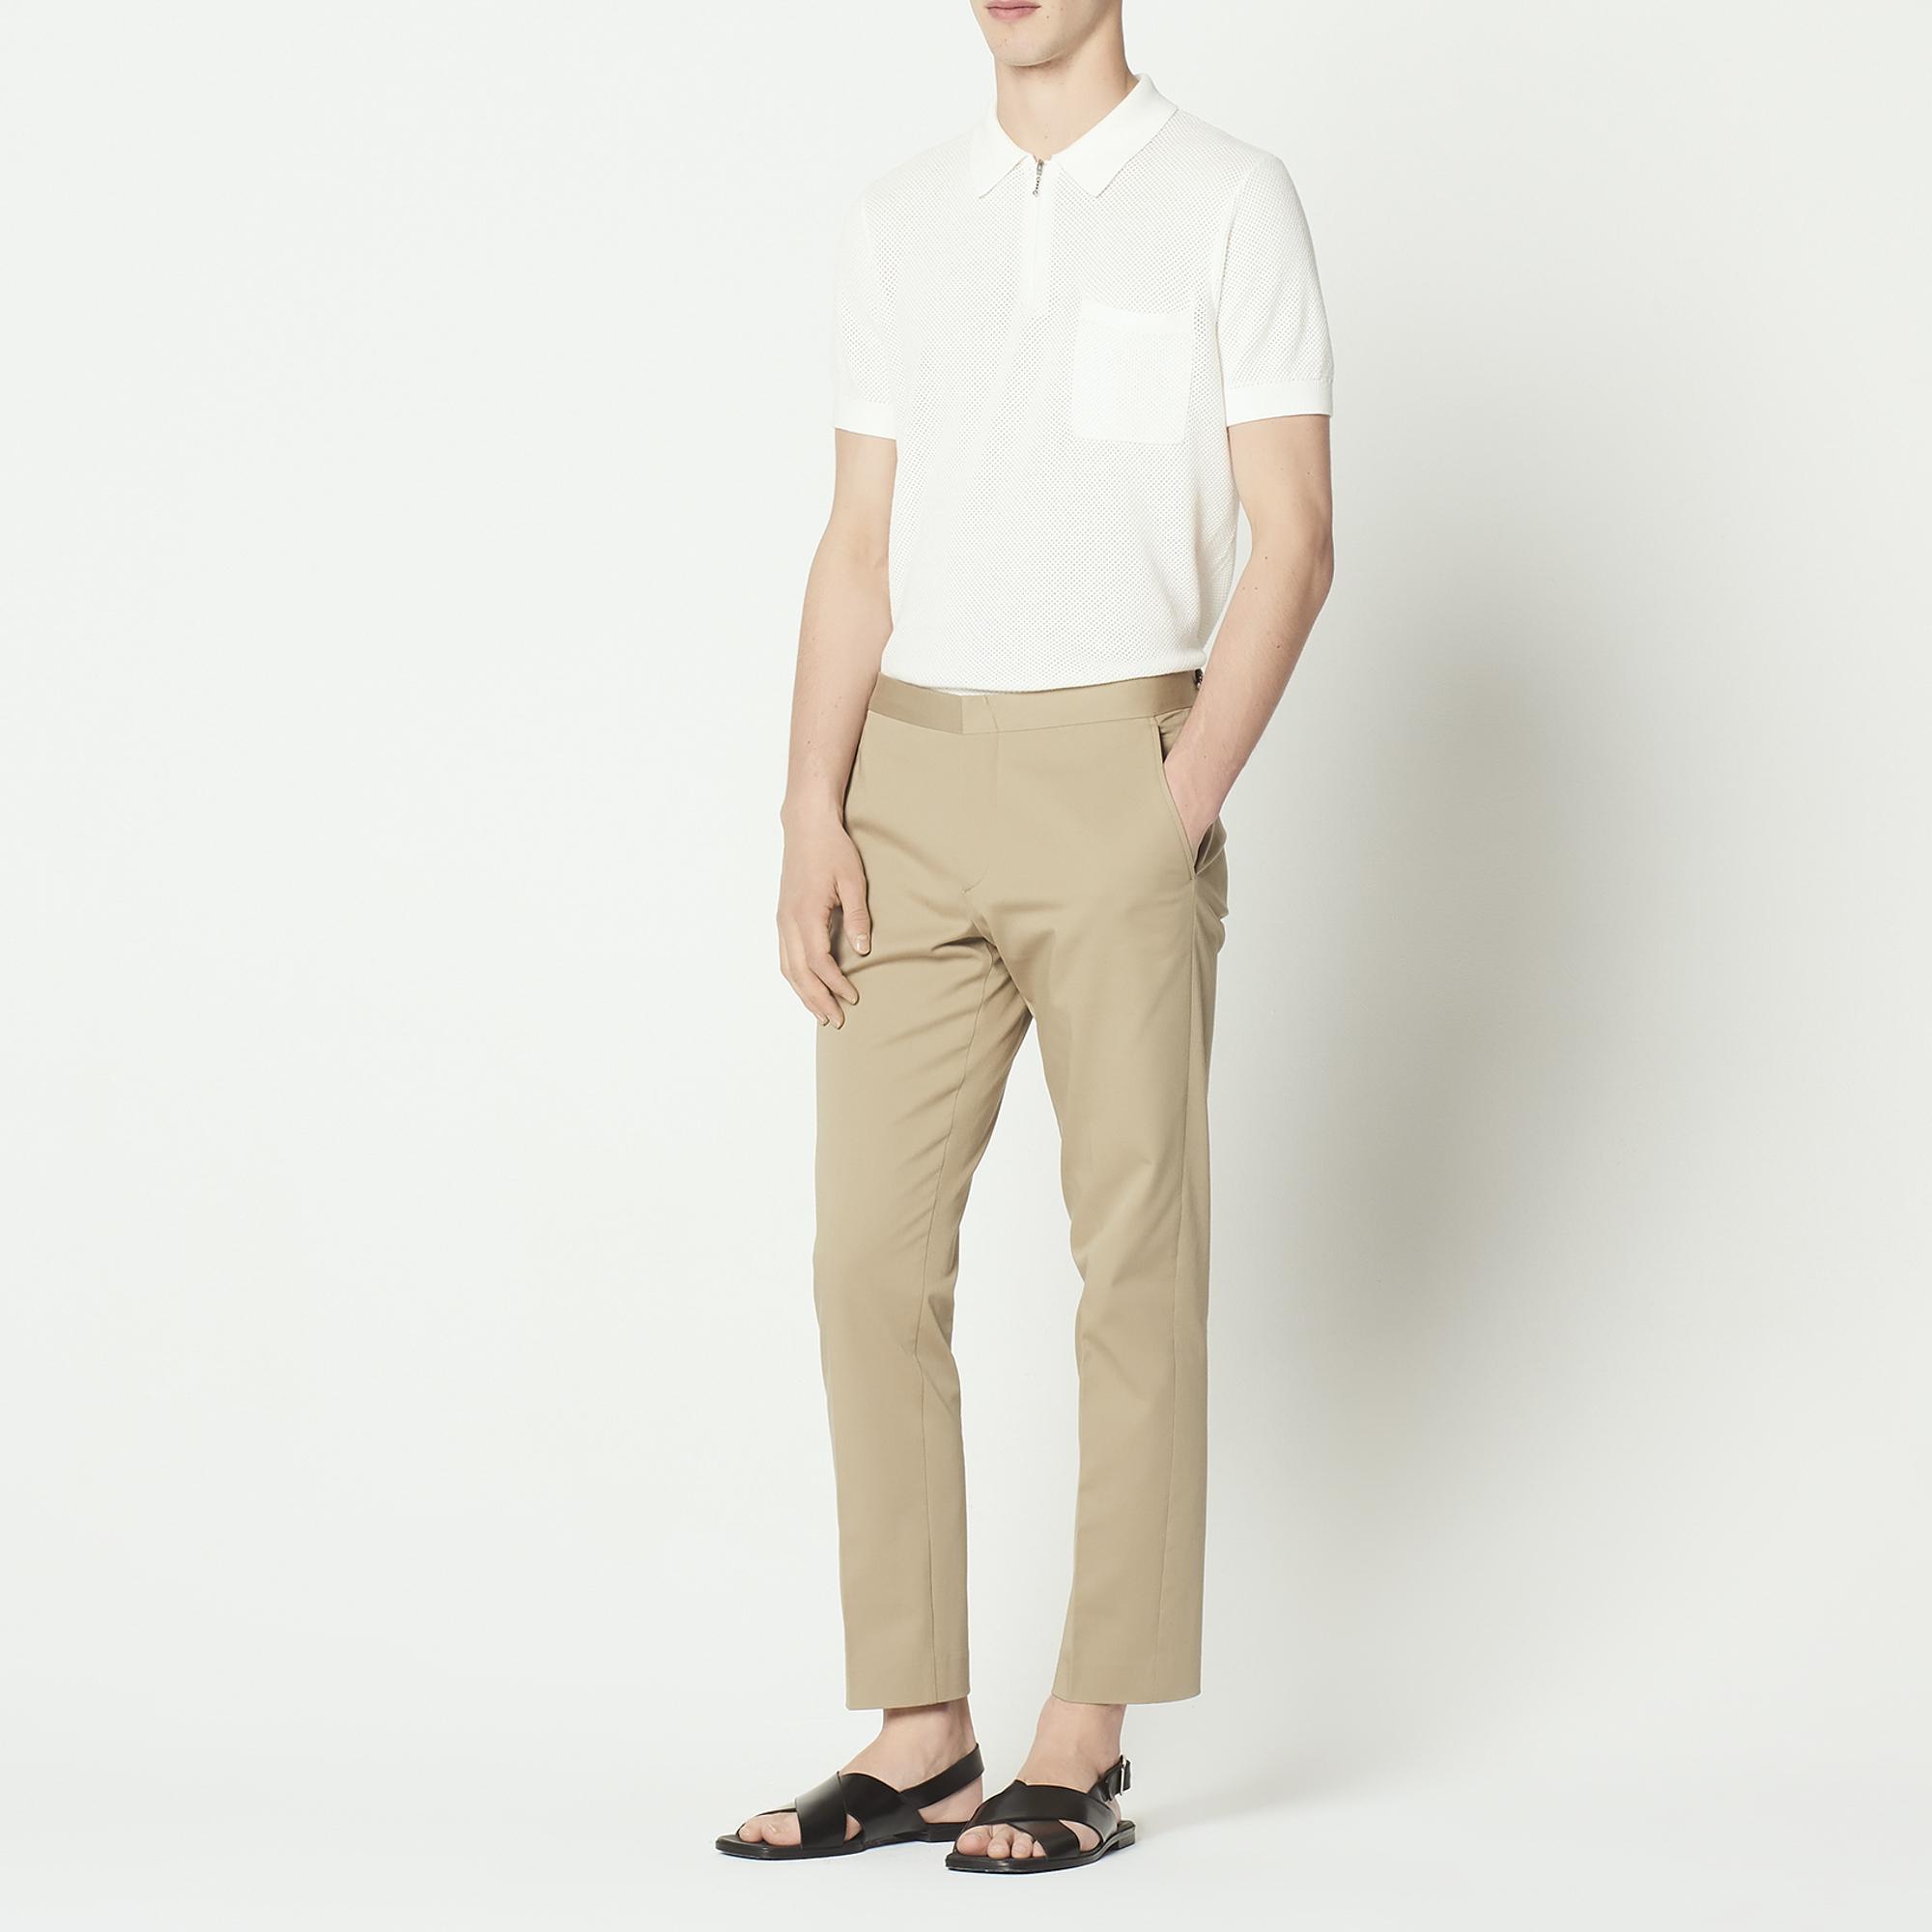 Pantaloni chino : Sandro x Mr Porter colore Sabbia